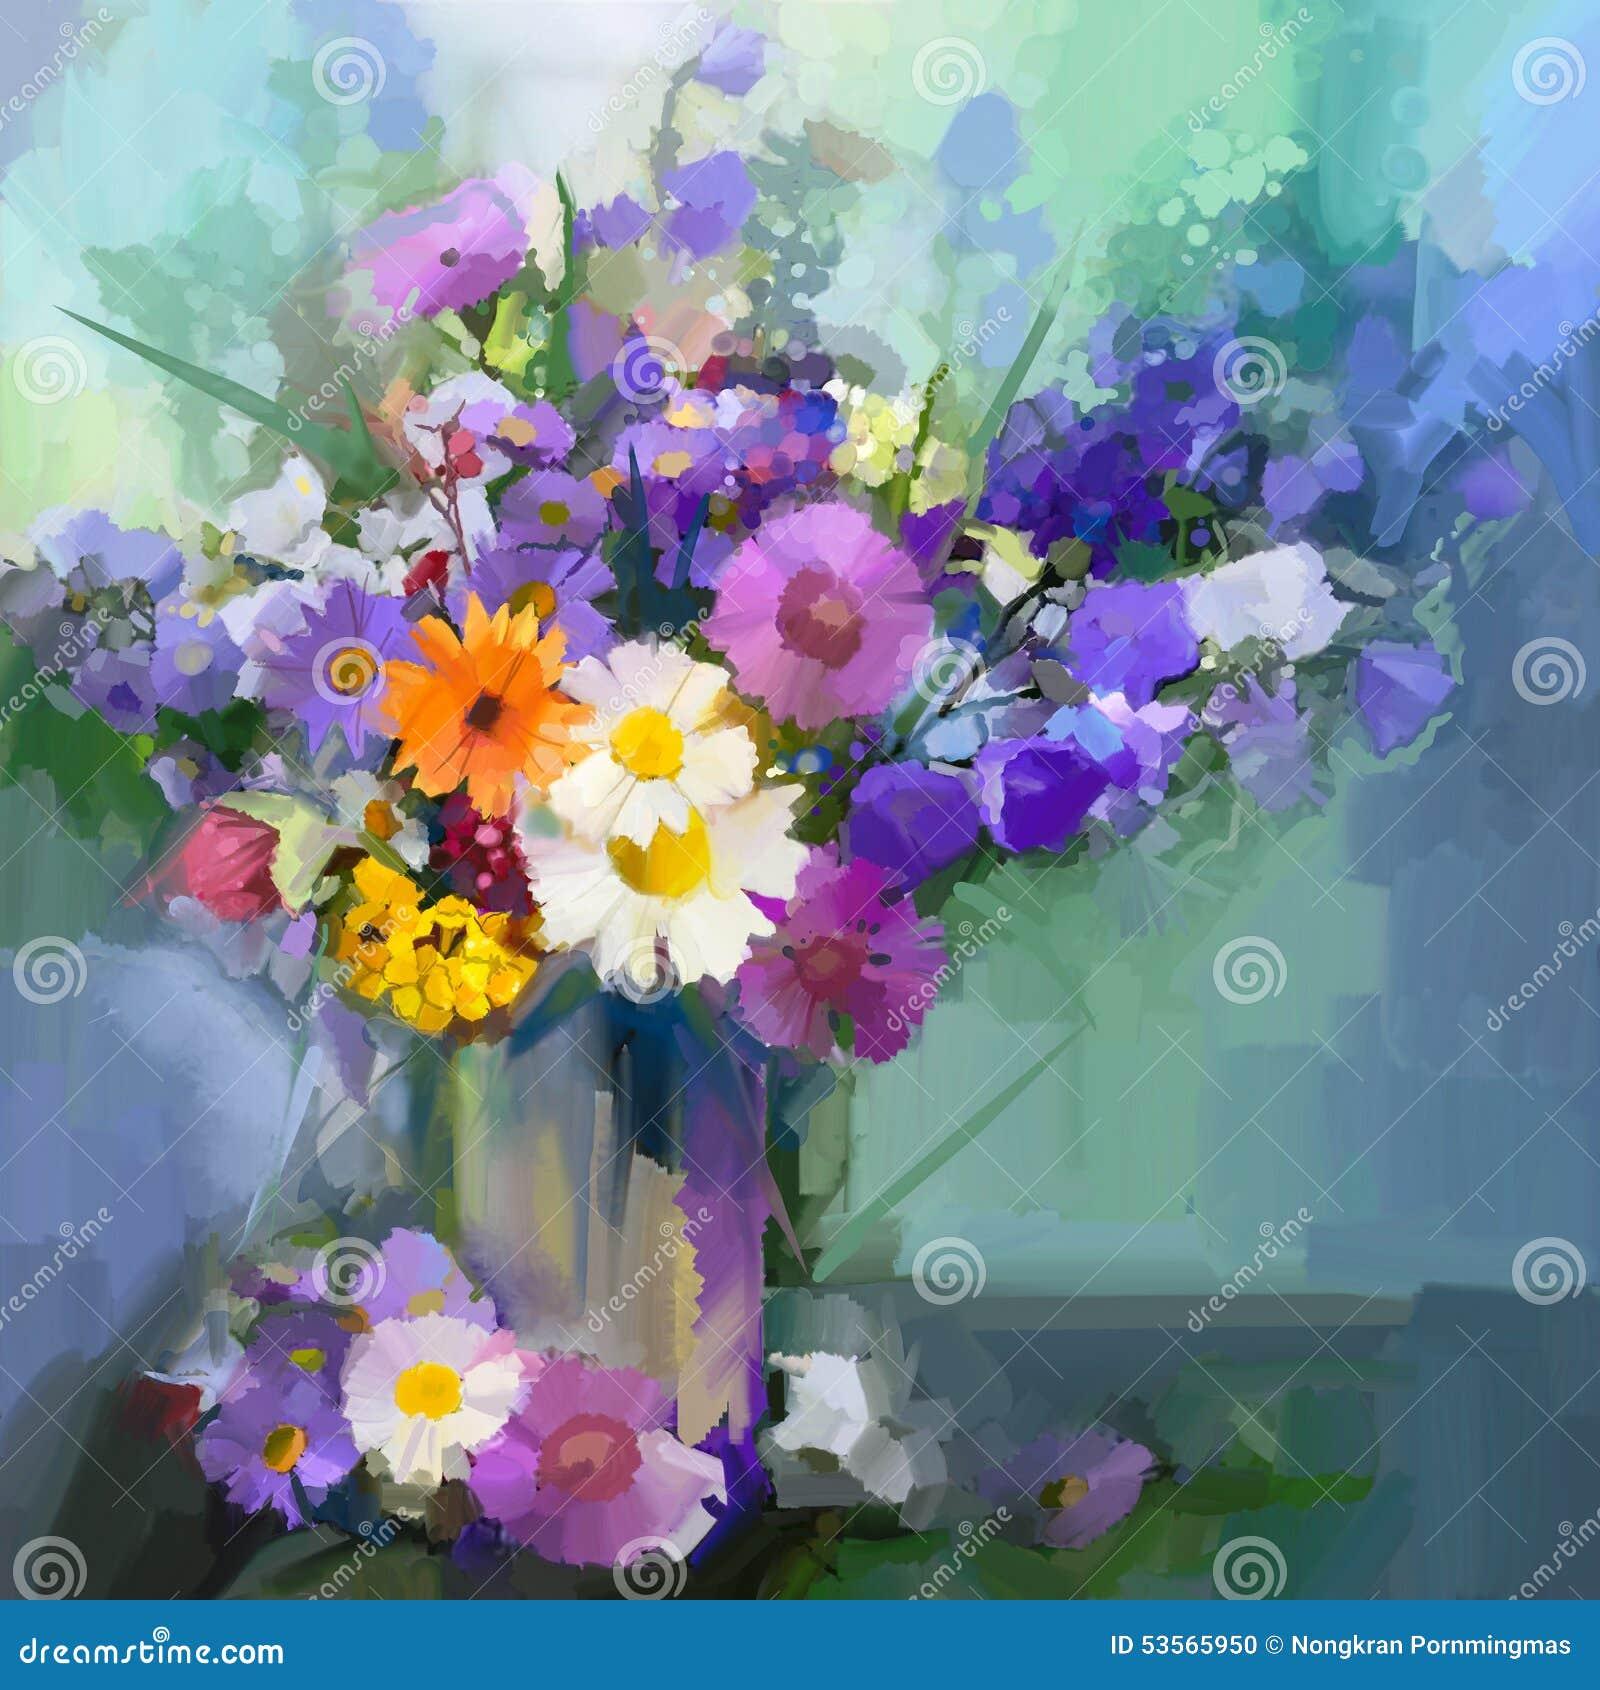 Oil painting daisy flowers in vase stock illustration for Dipinti ad olio fiori